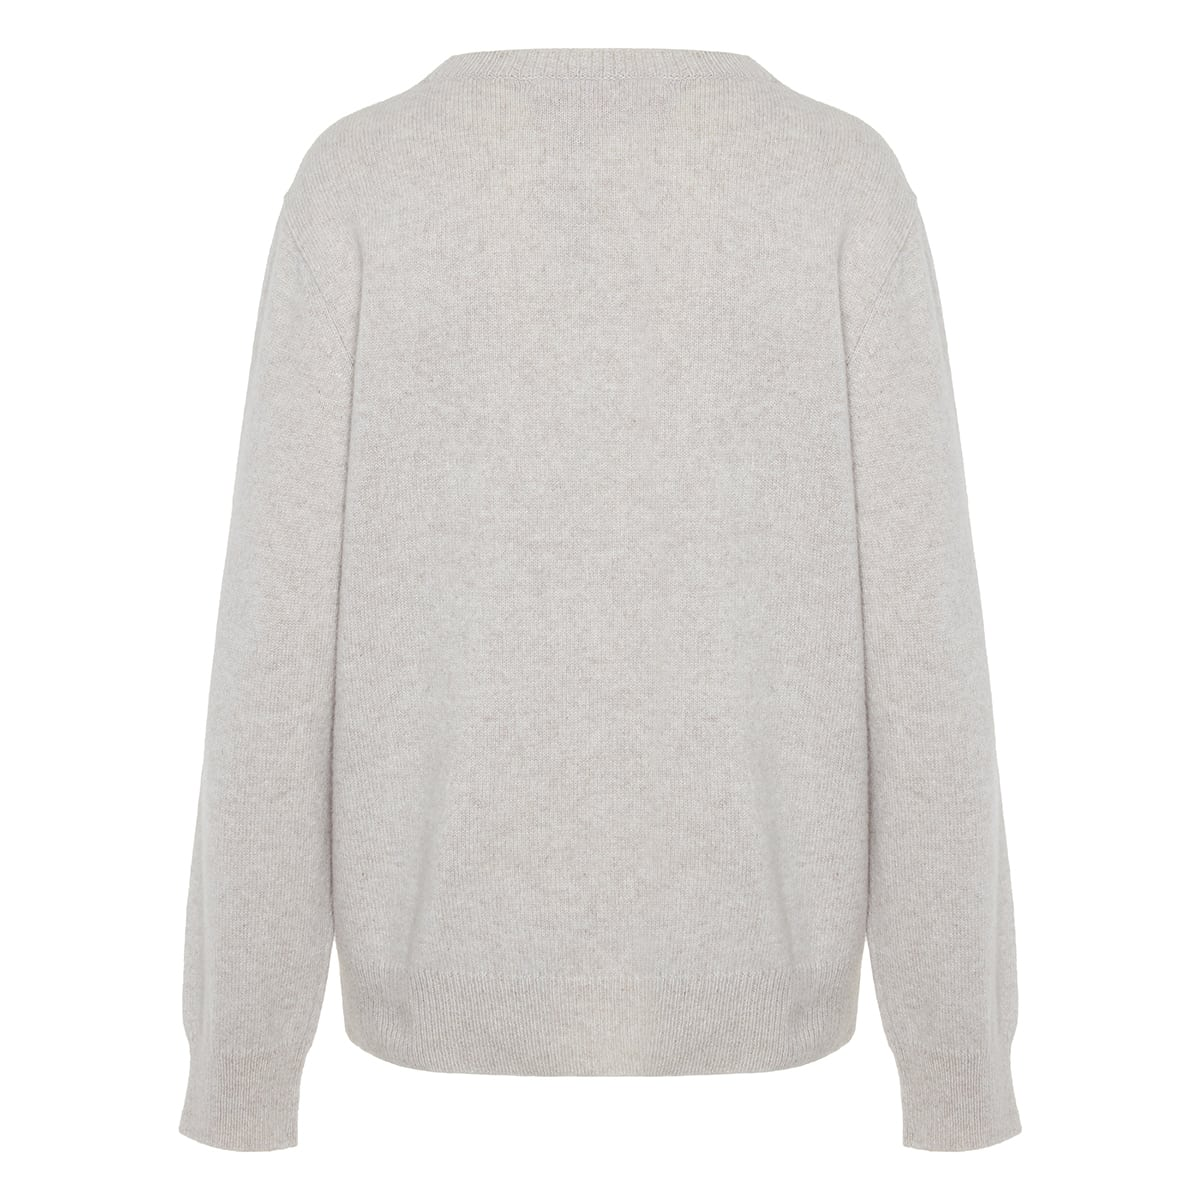 Odd Space cashmere sweater